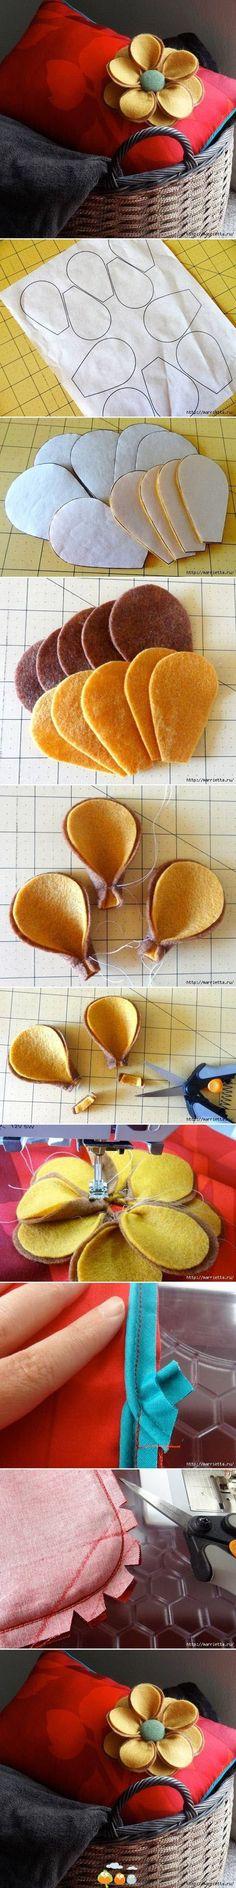 DIY Decorative Felt Flower Pillow - Picmia